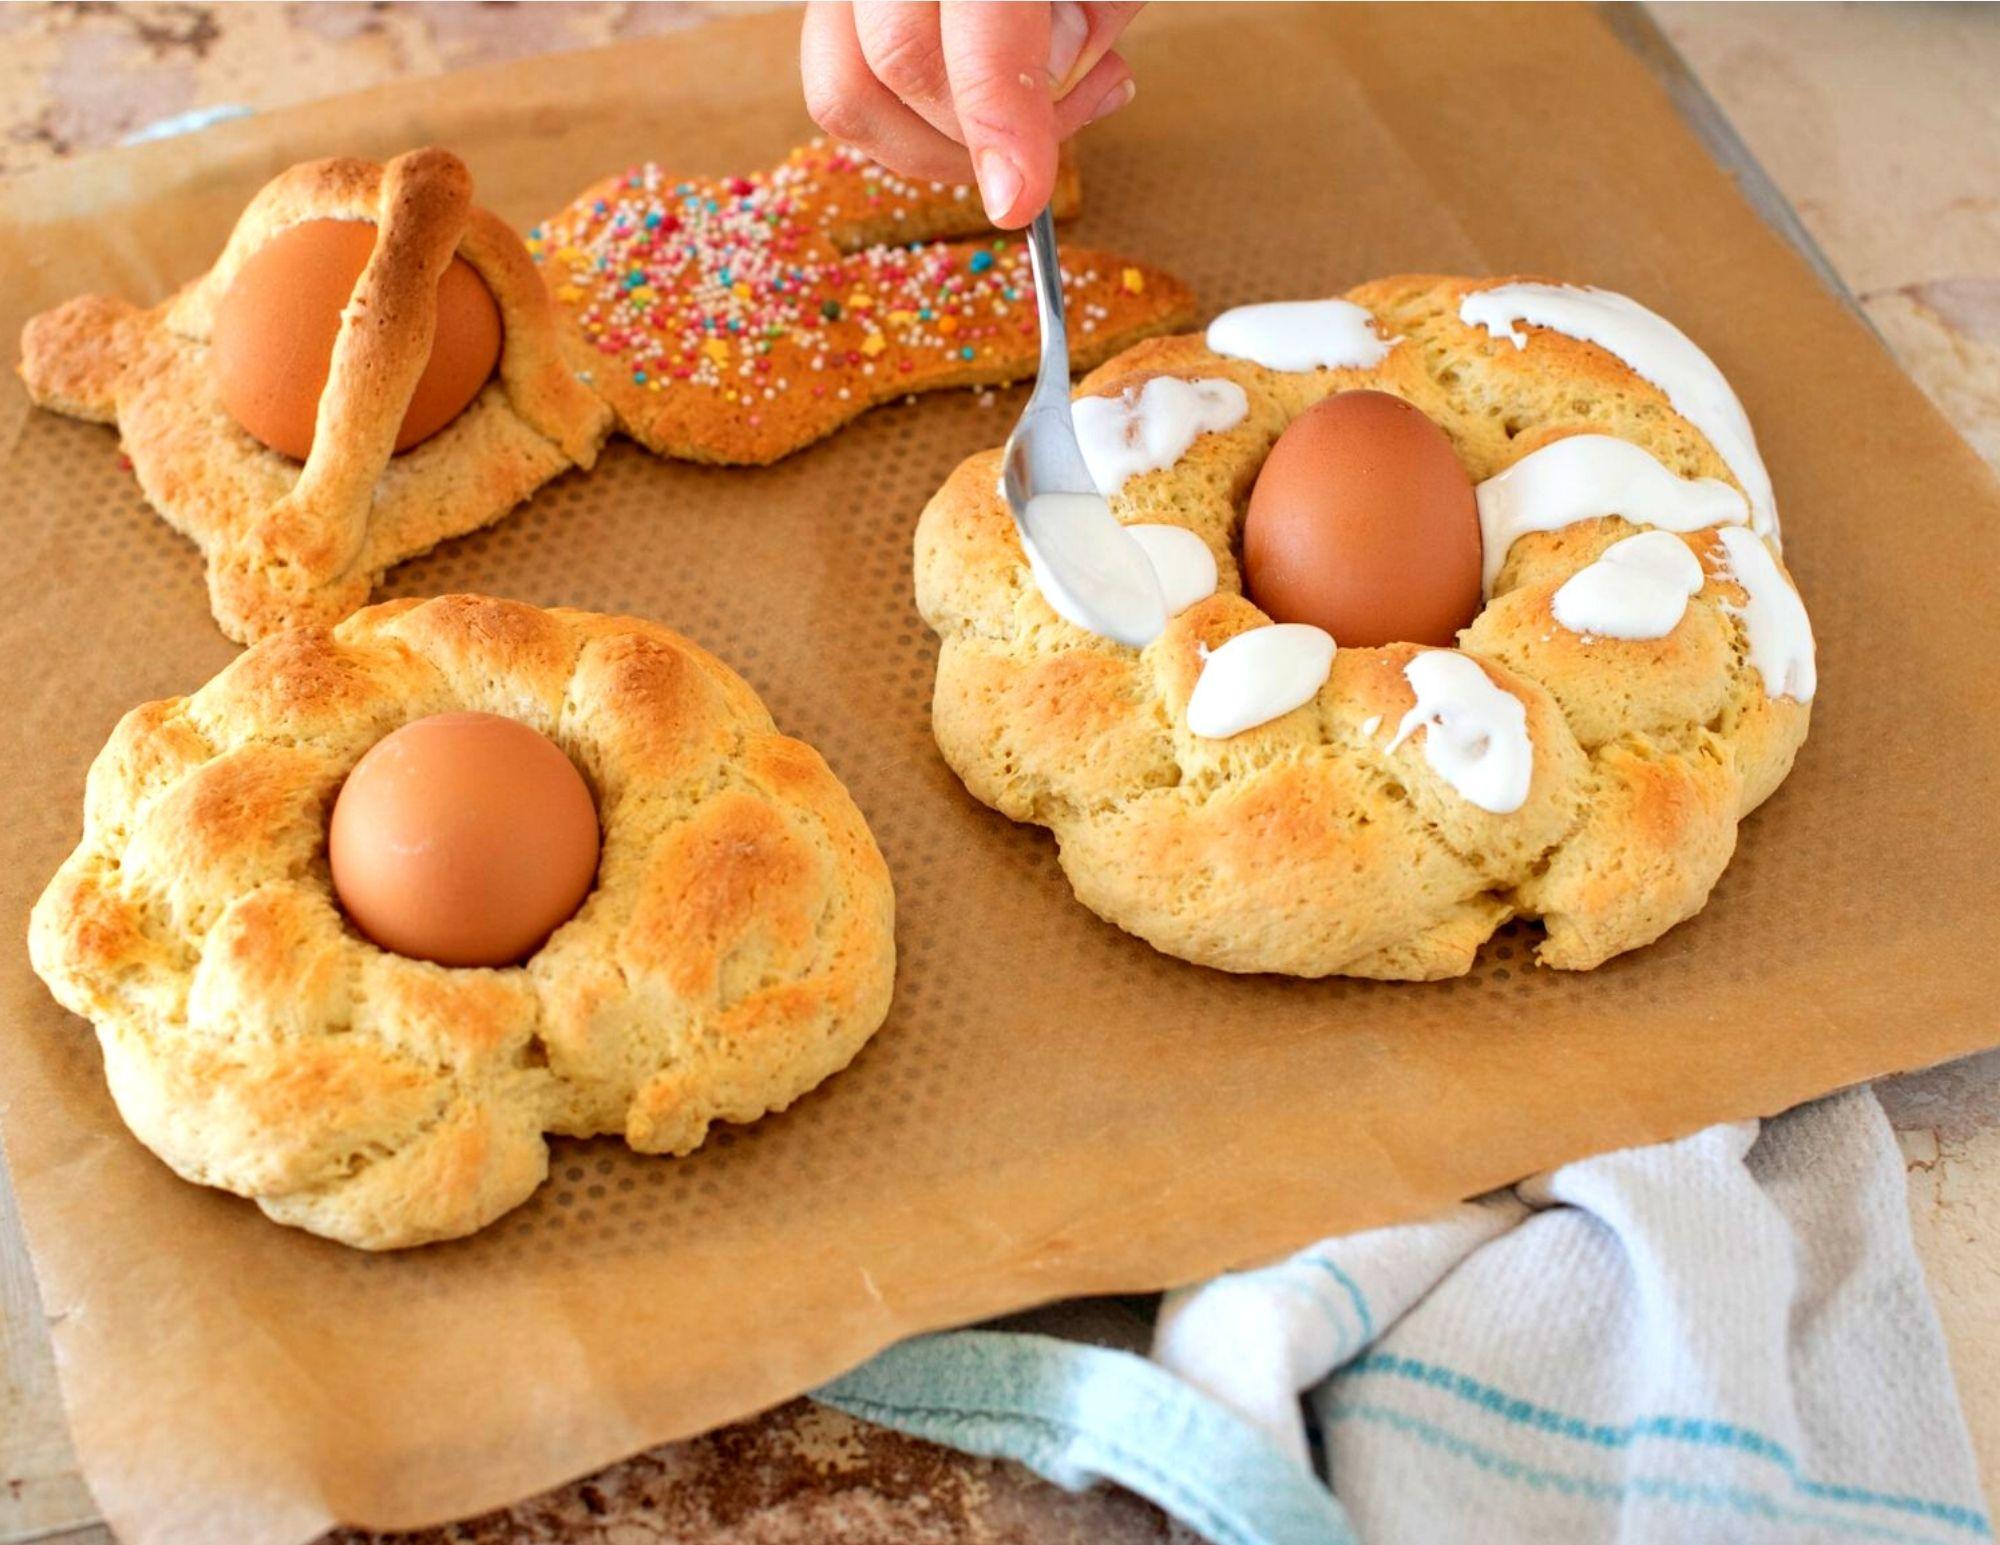 Scorciatelle pugliesi Italian baking